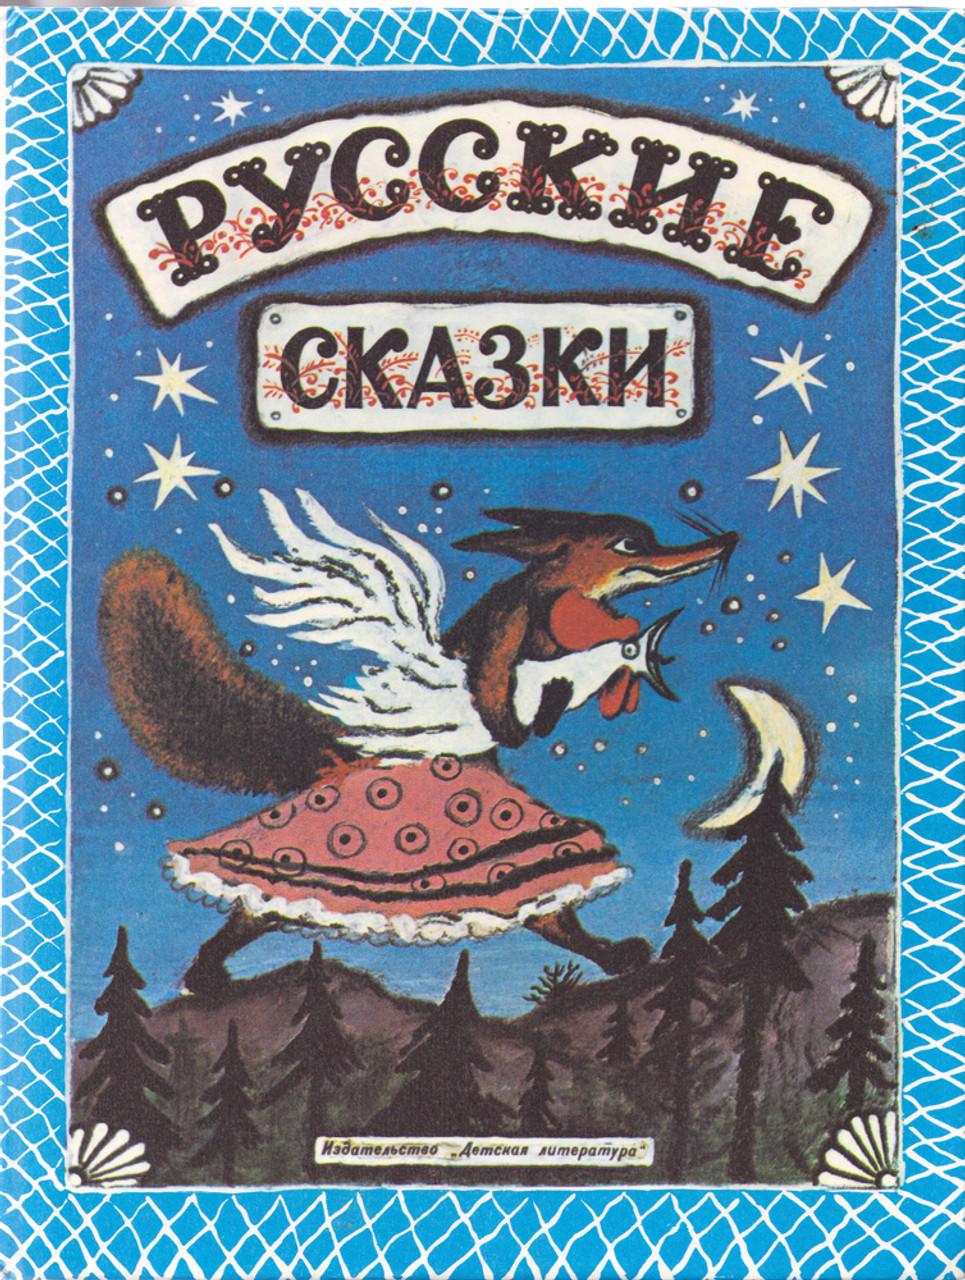 Русские сказки (Russian Tales)